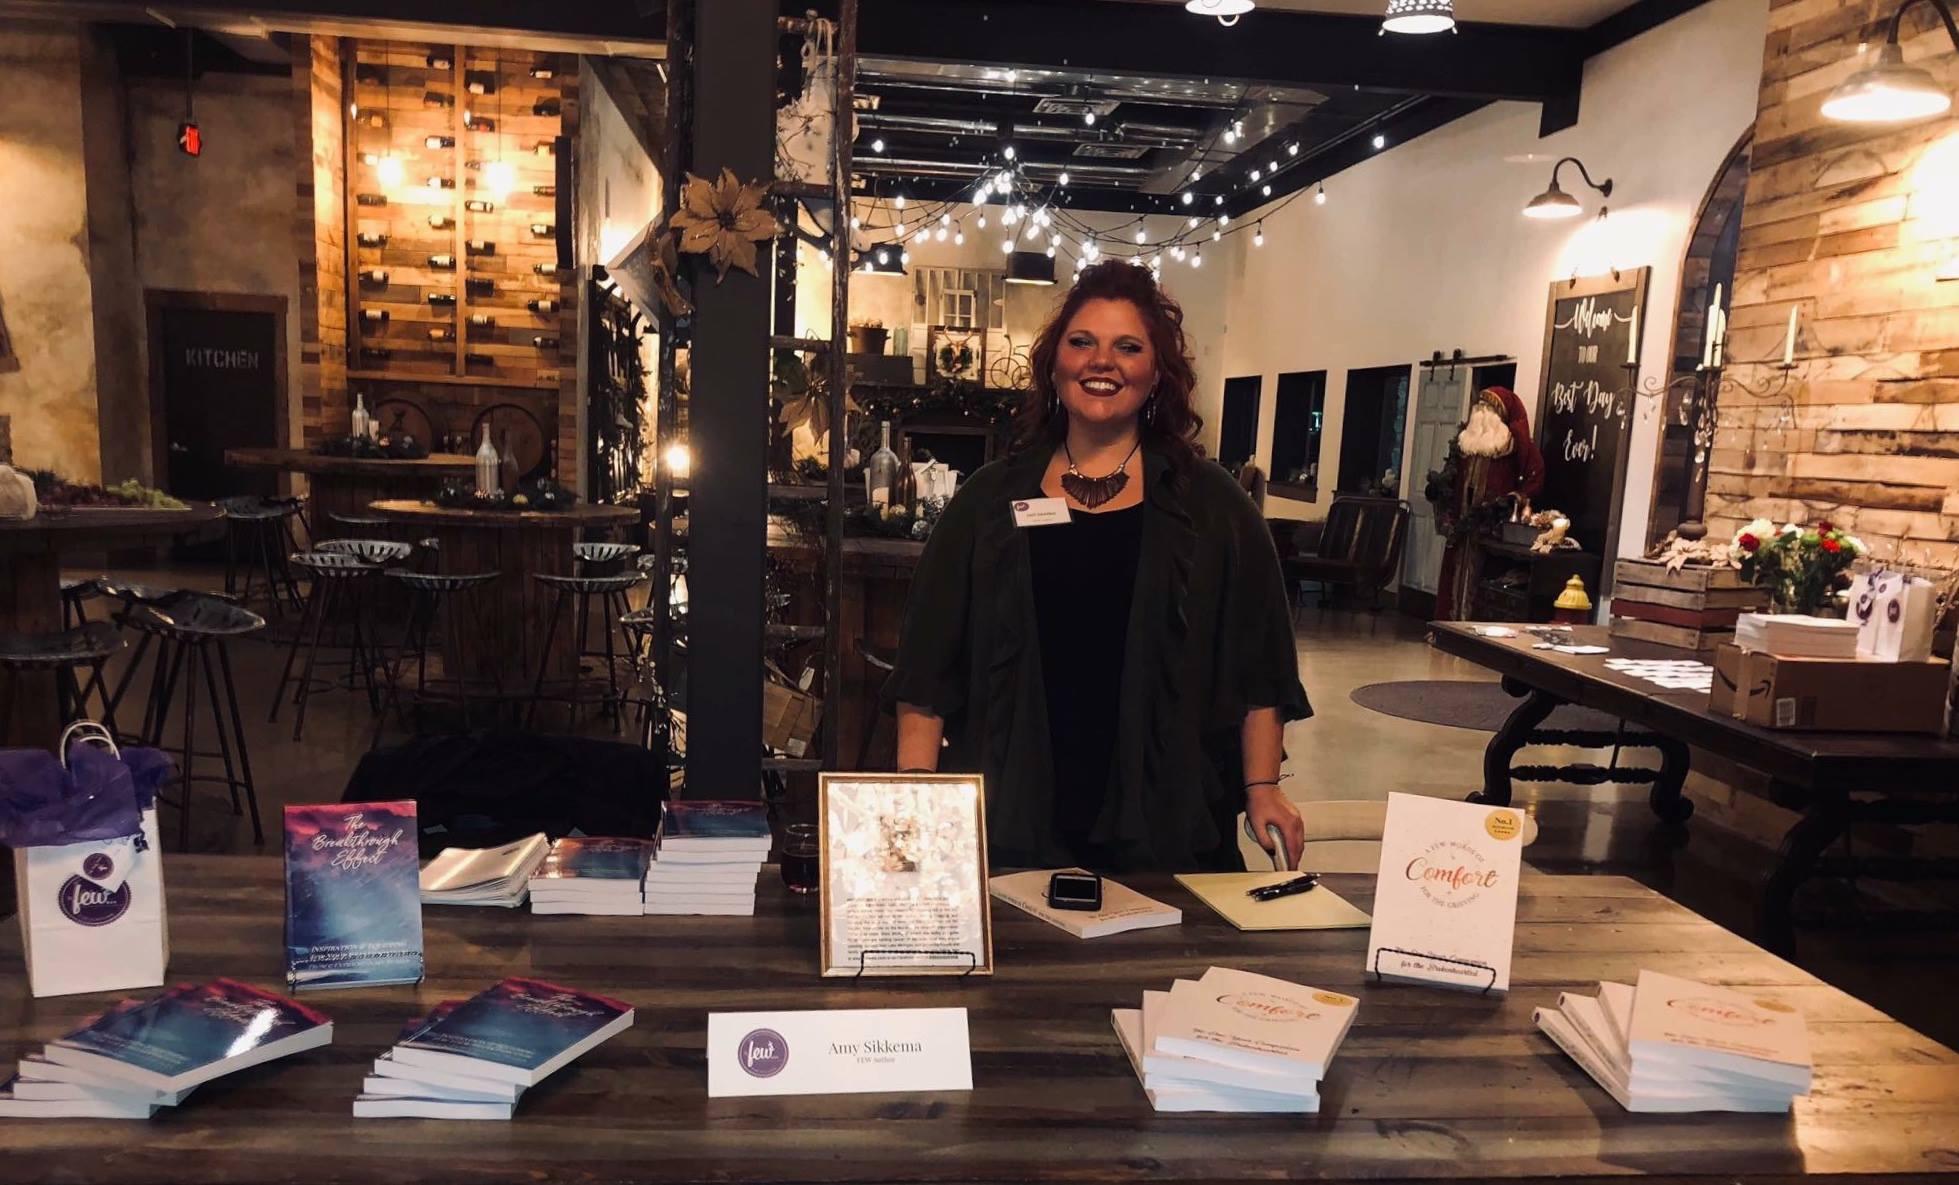 Kimberly Joy Krueger books